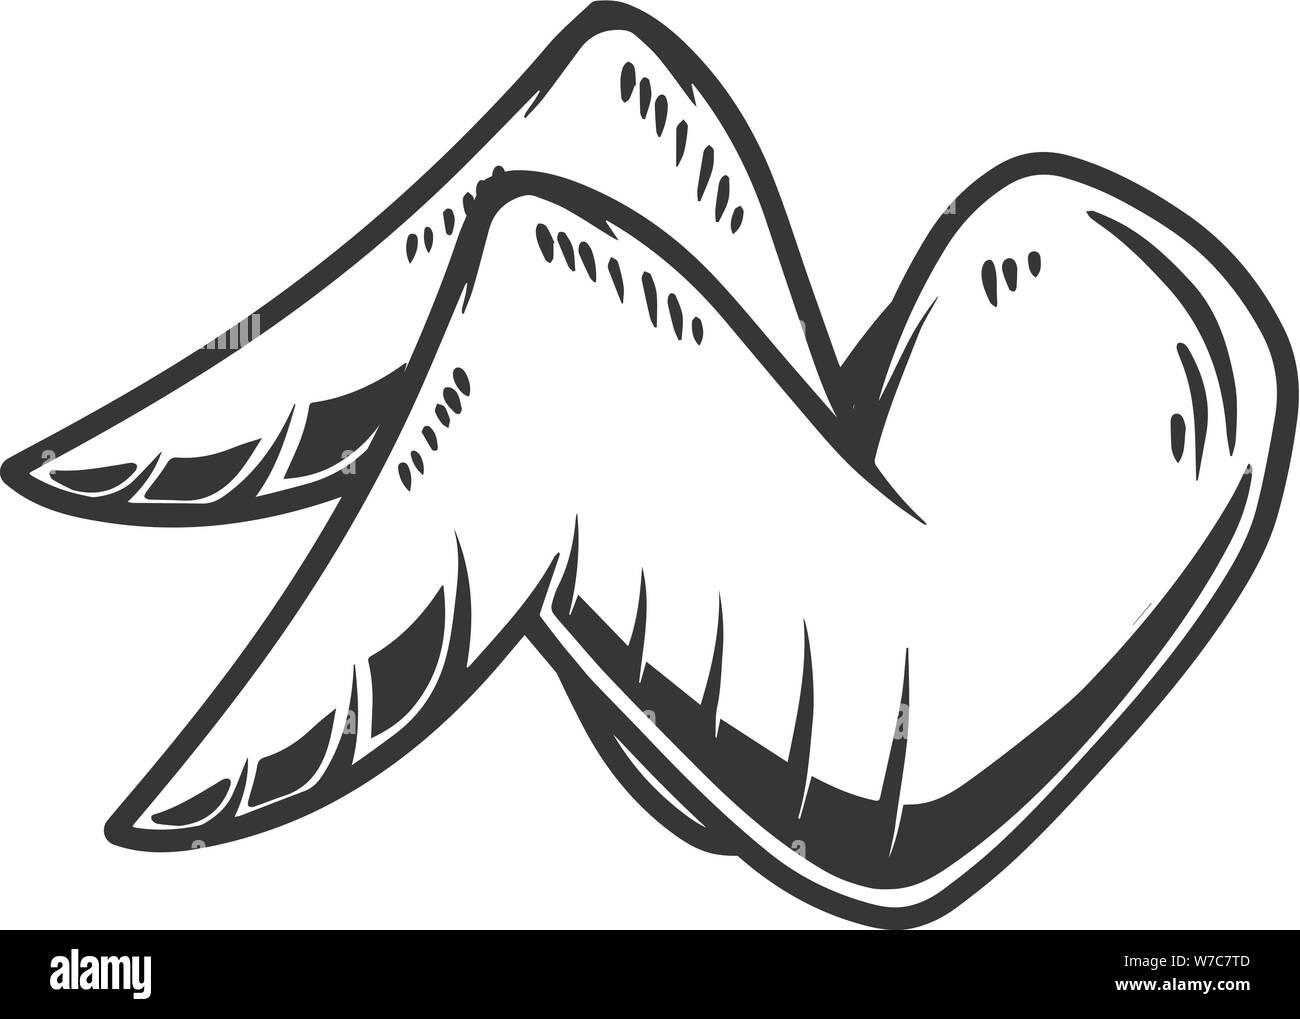 Chicken wings on white background. Design element for logo, label, sign, poster, card, banner, flyer. Vector illustration, Chicken wings on white back Stock Vector